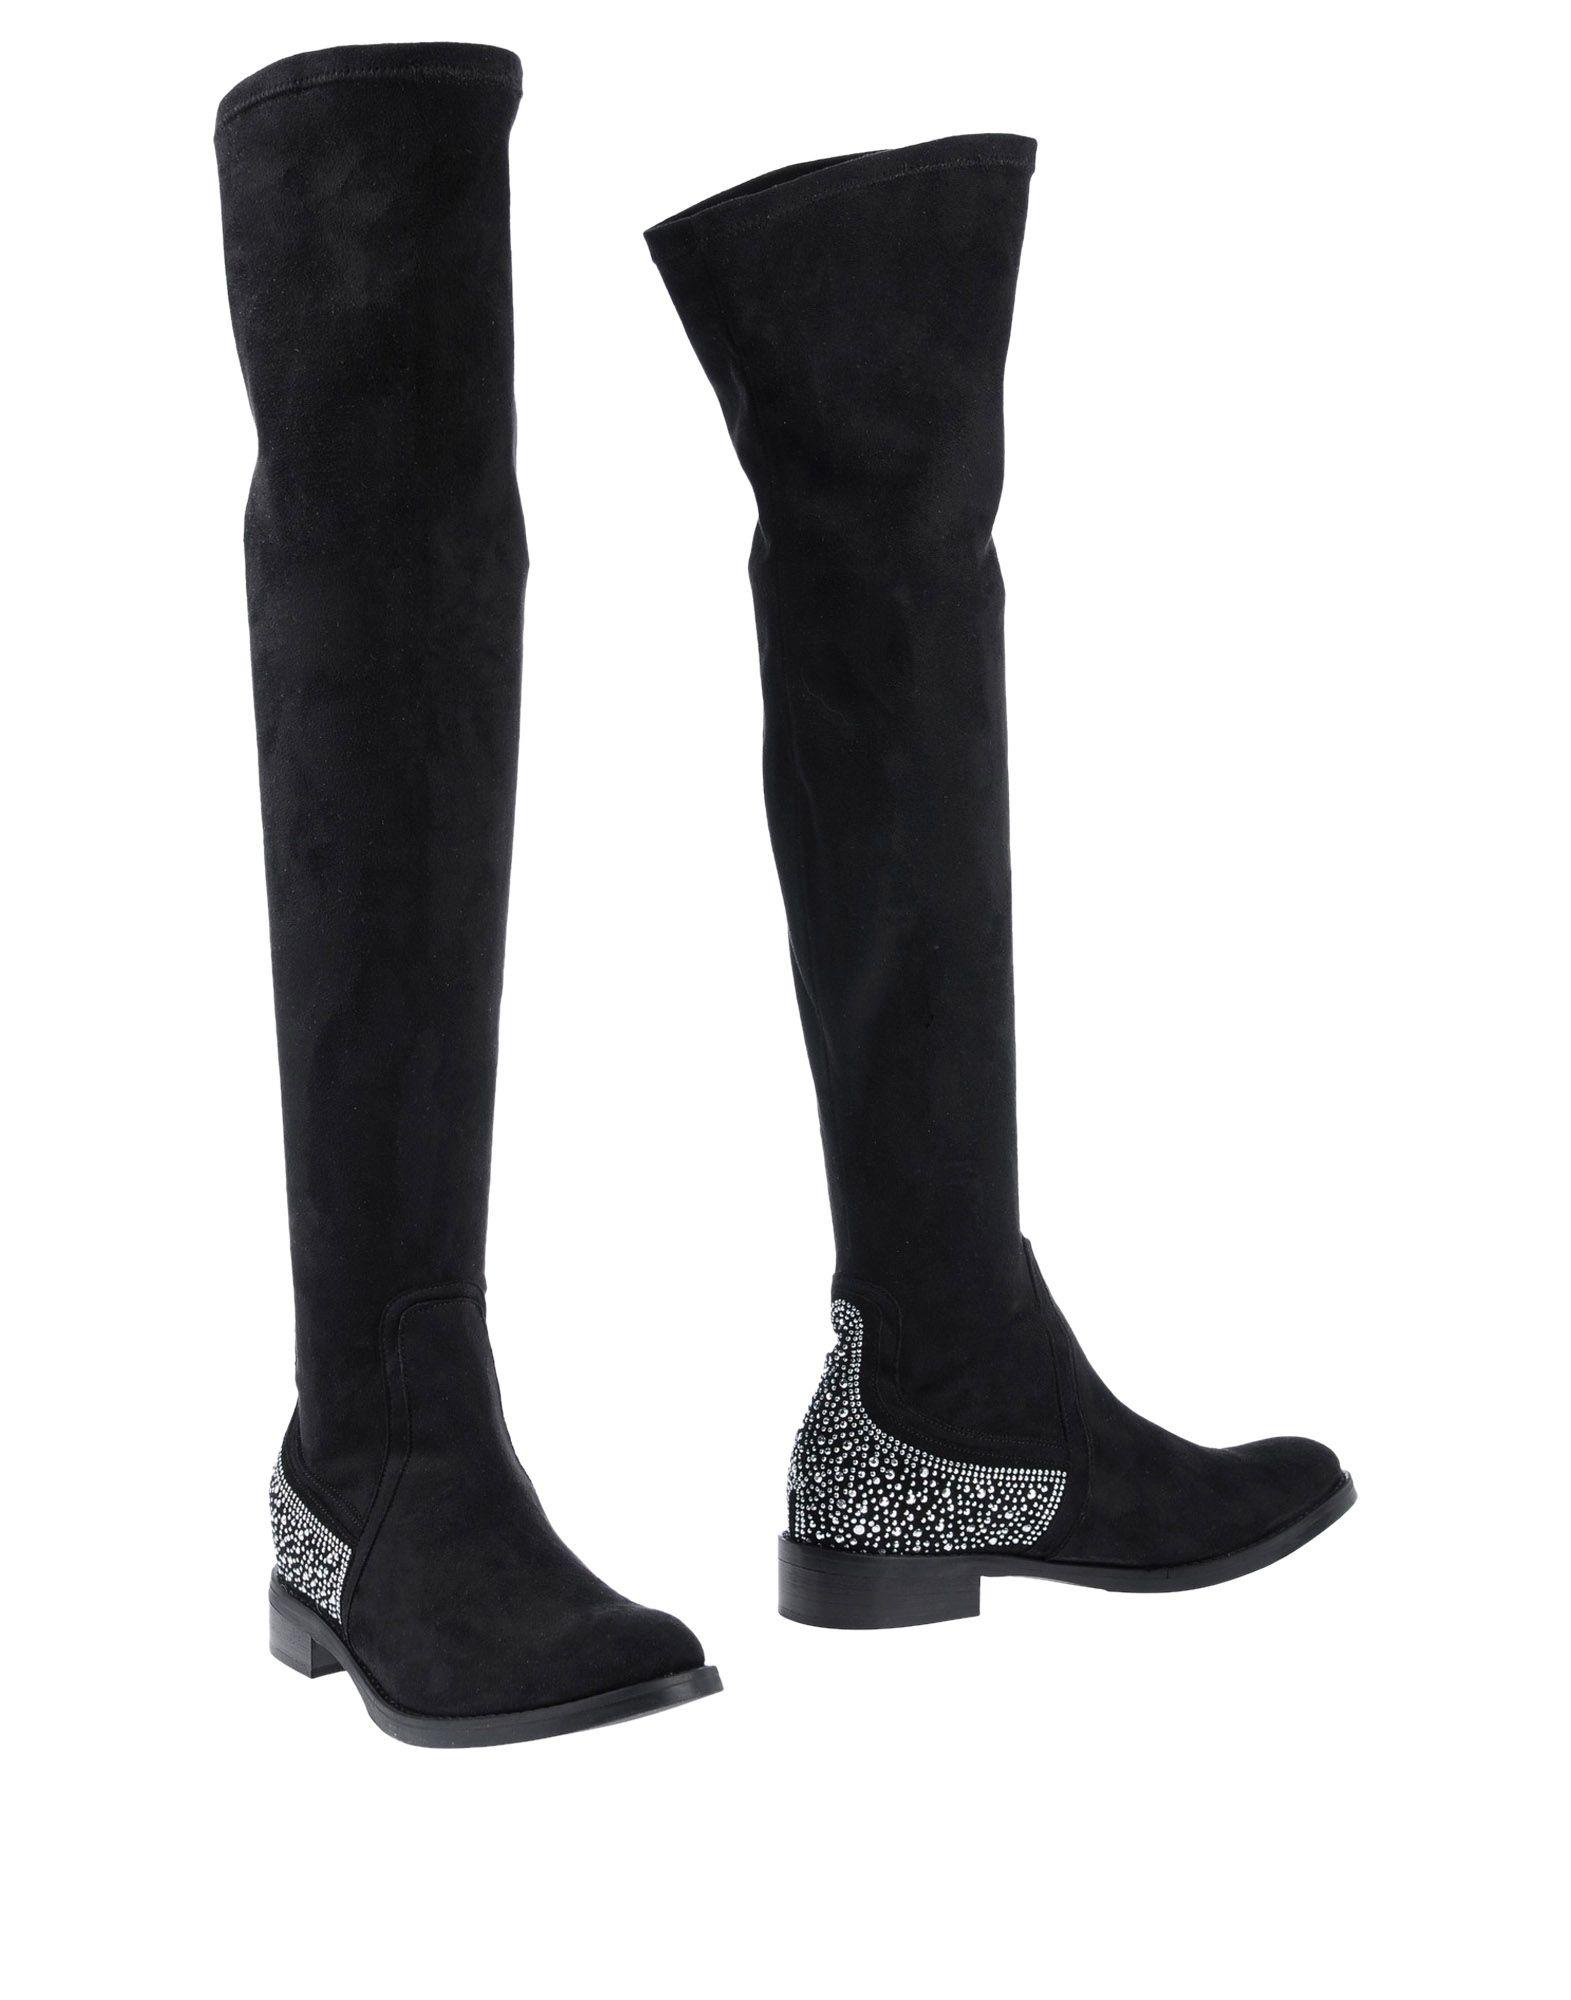 Stilvolle billige Schuhe Damen Stele Stiefel Damen Schuhe  11469259AP 206d63